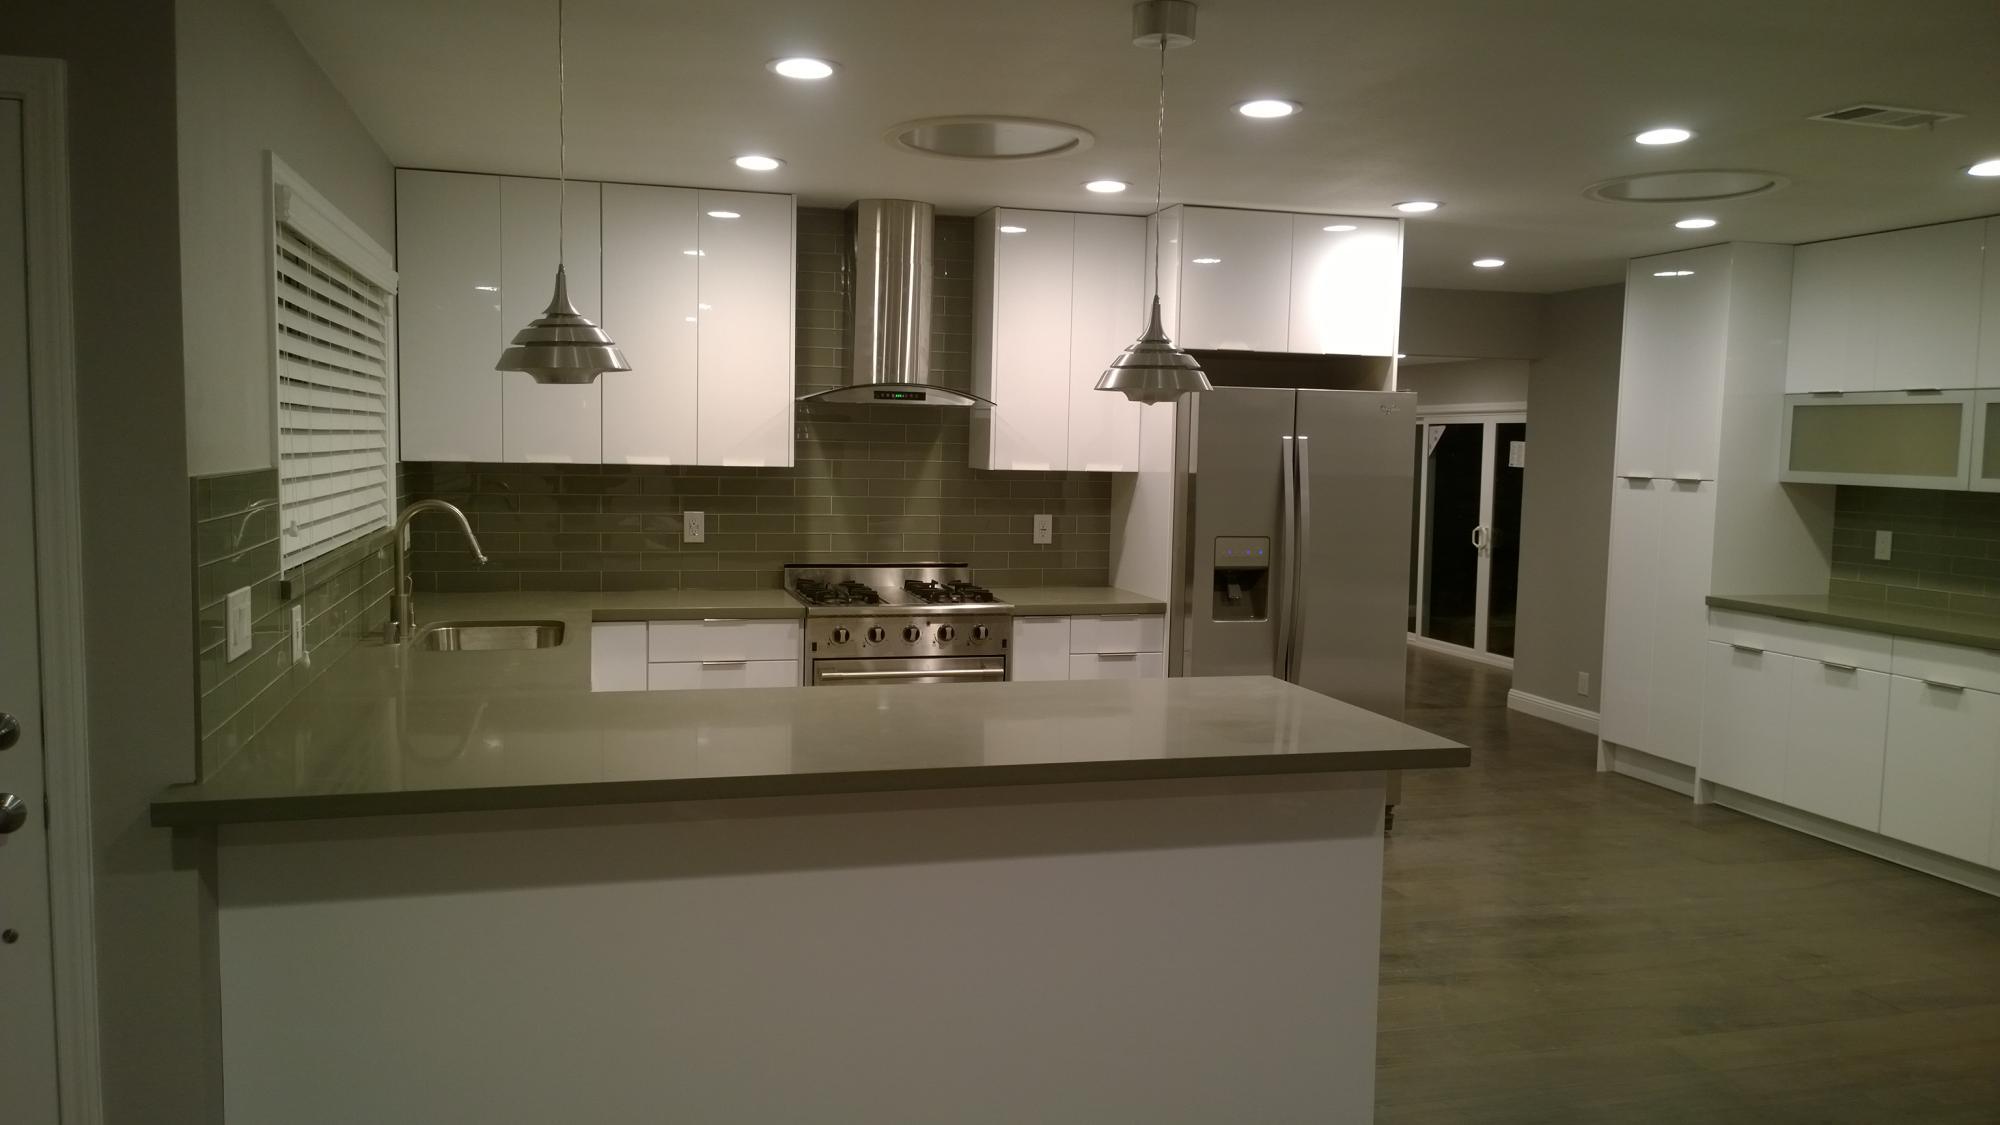 Home Repair Services Handyman Services Home Improvement